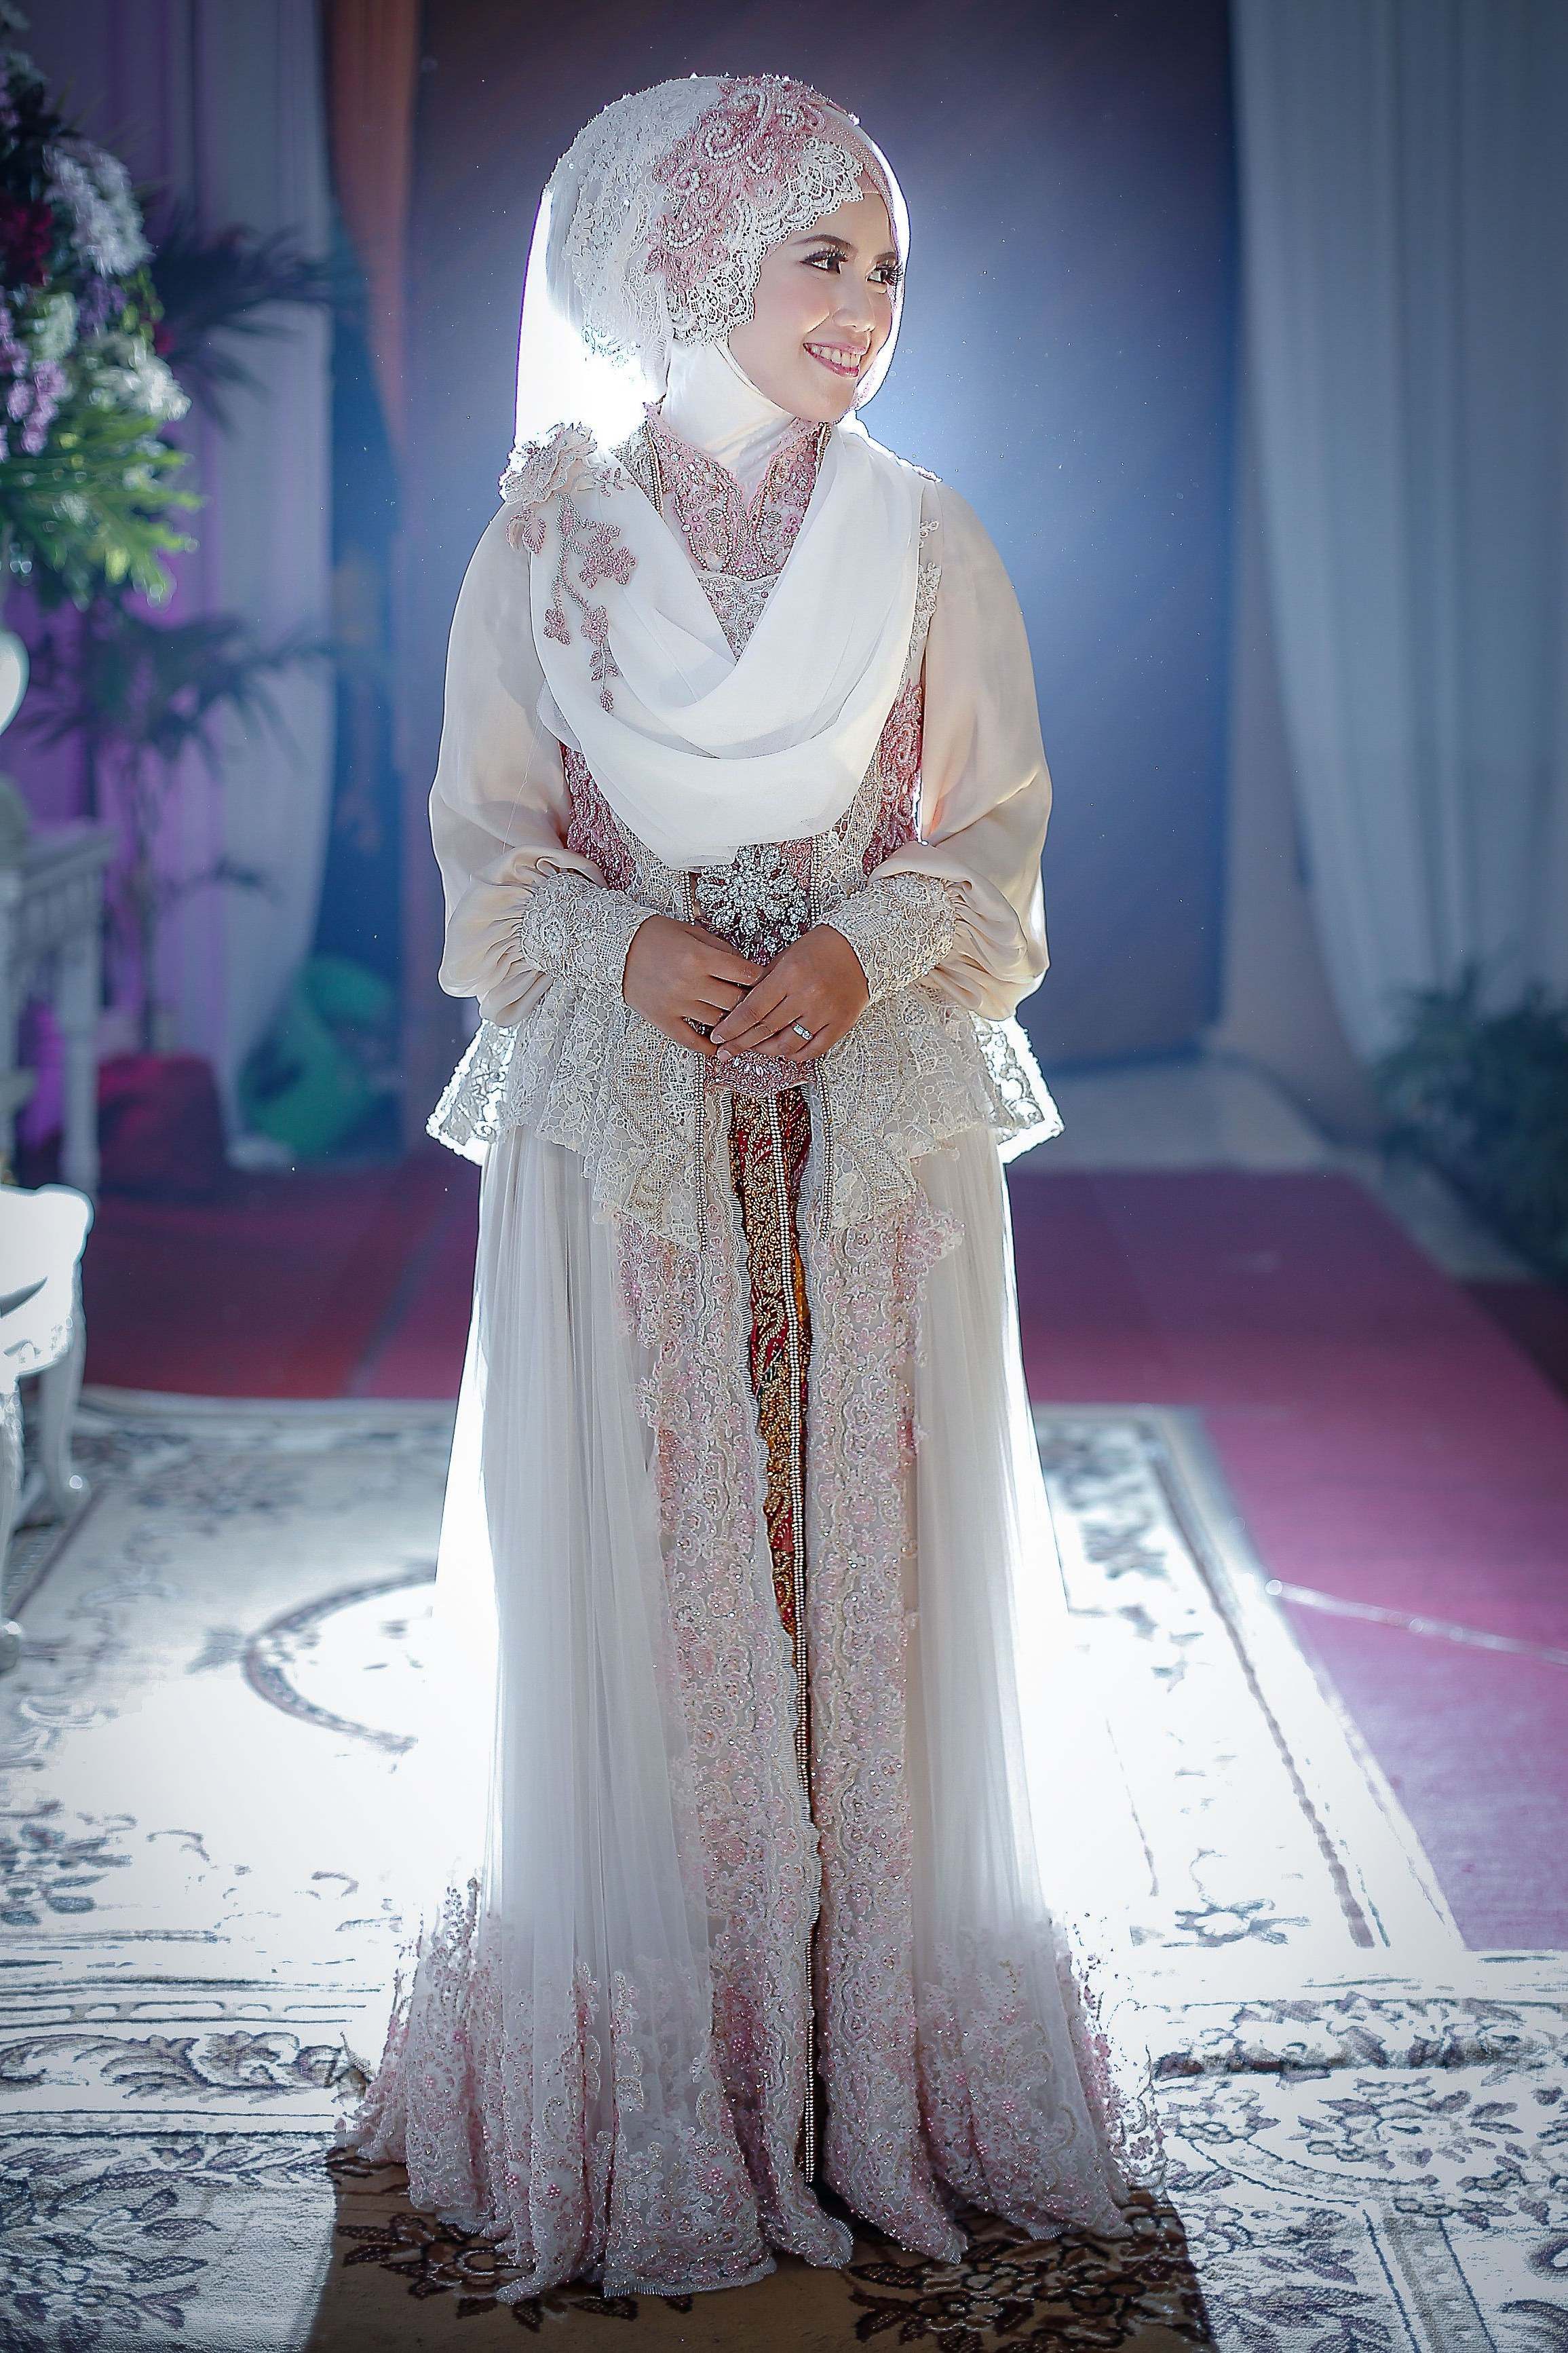 Model Baju Pengantin Muslimah Dian Pelangi 9ddf the Bride In Kebaya Wedding Dress Wedding Shot List Bride